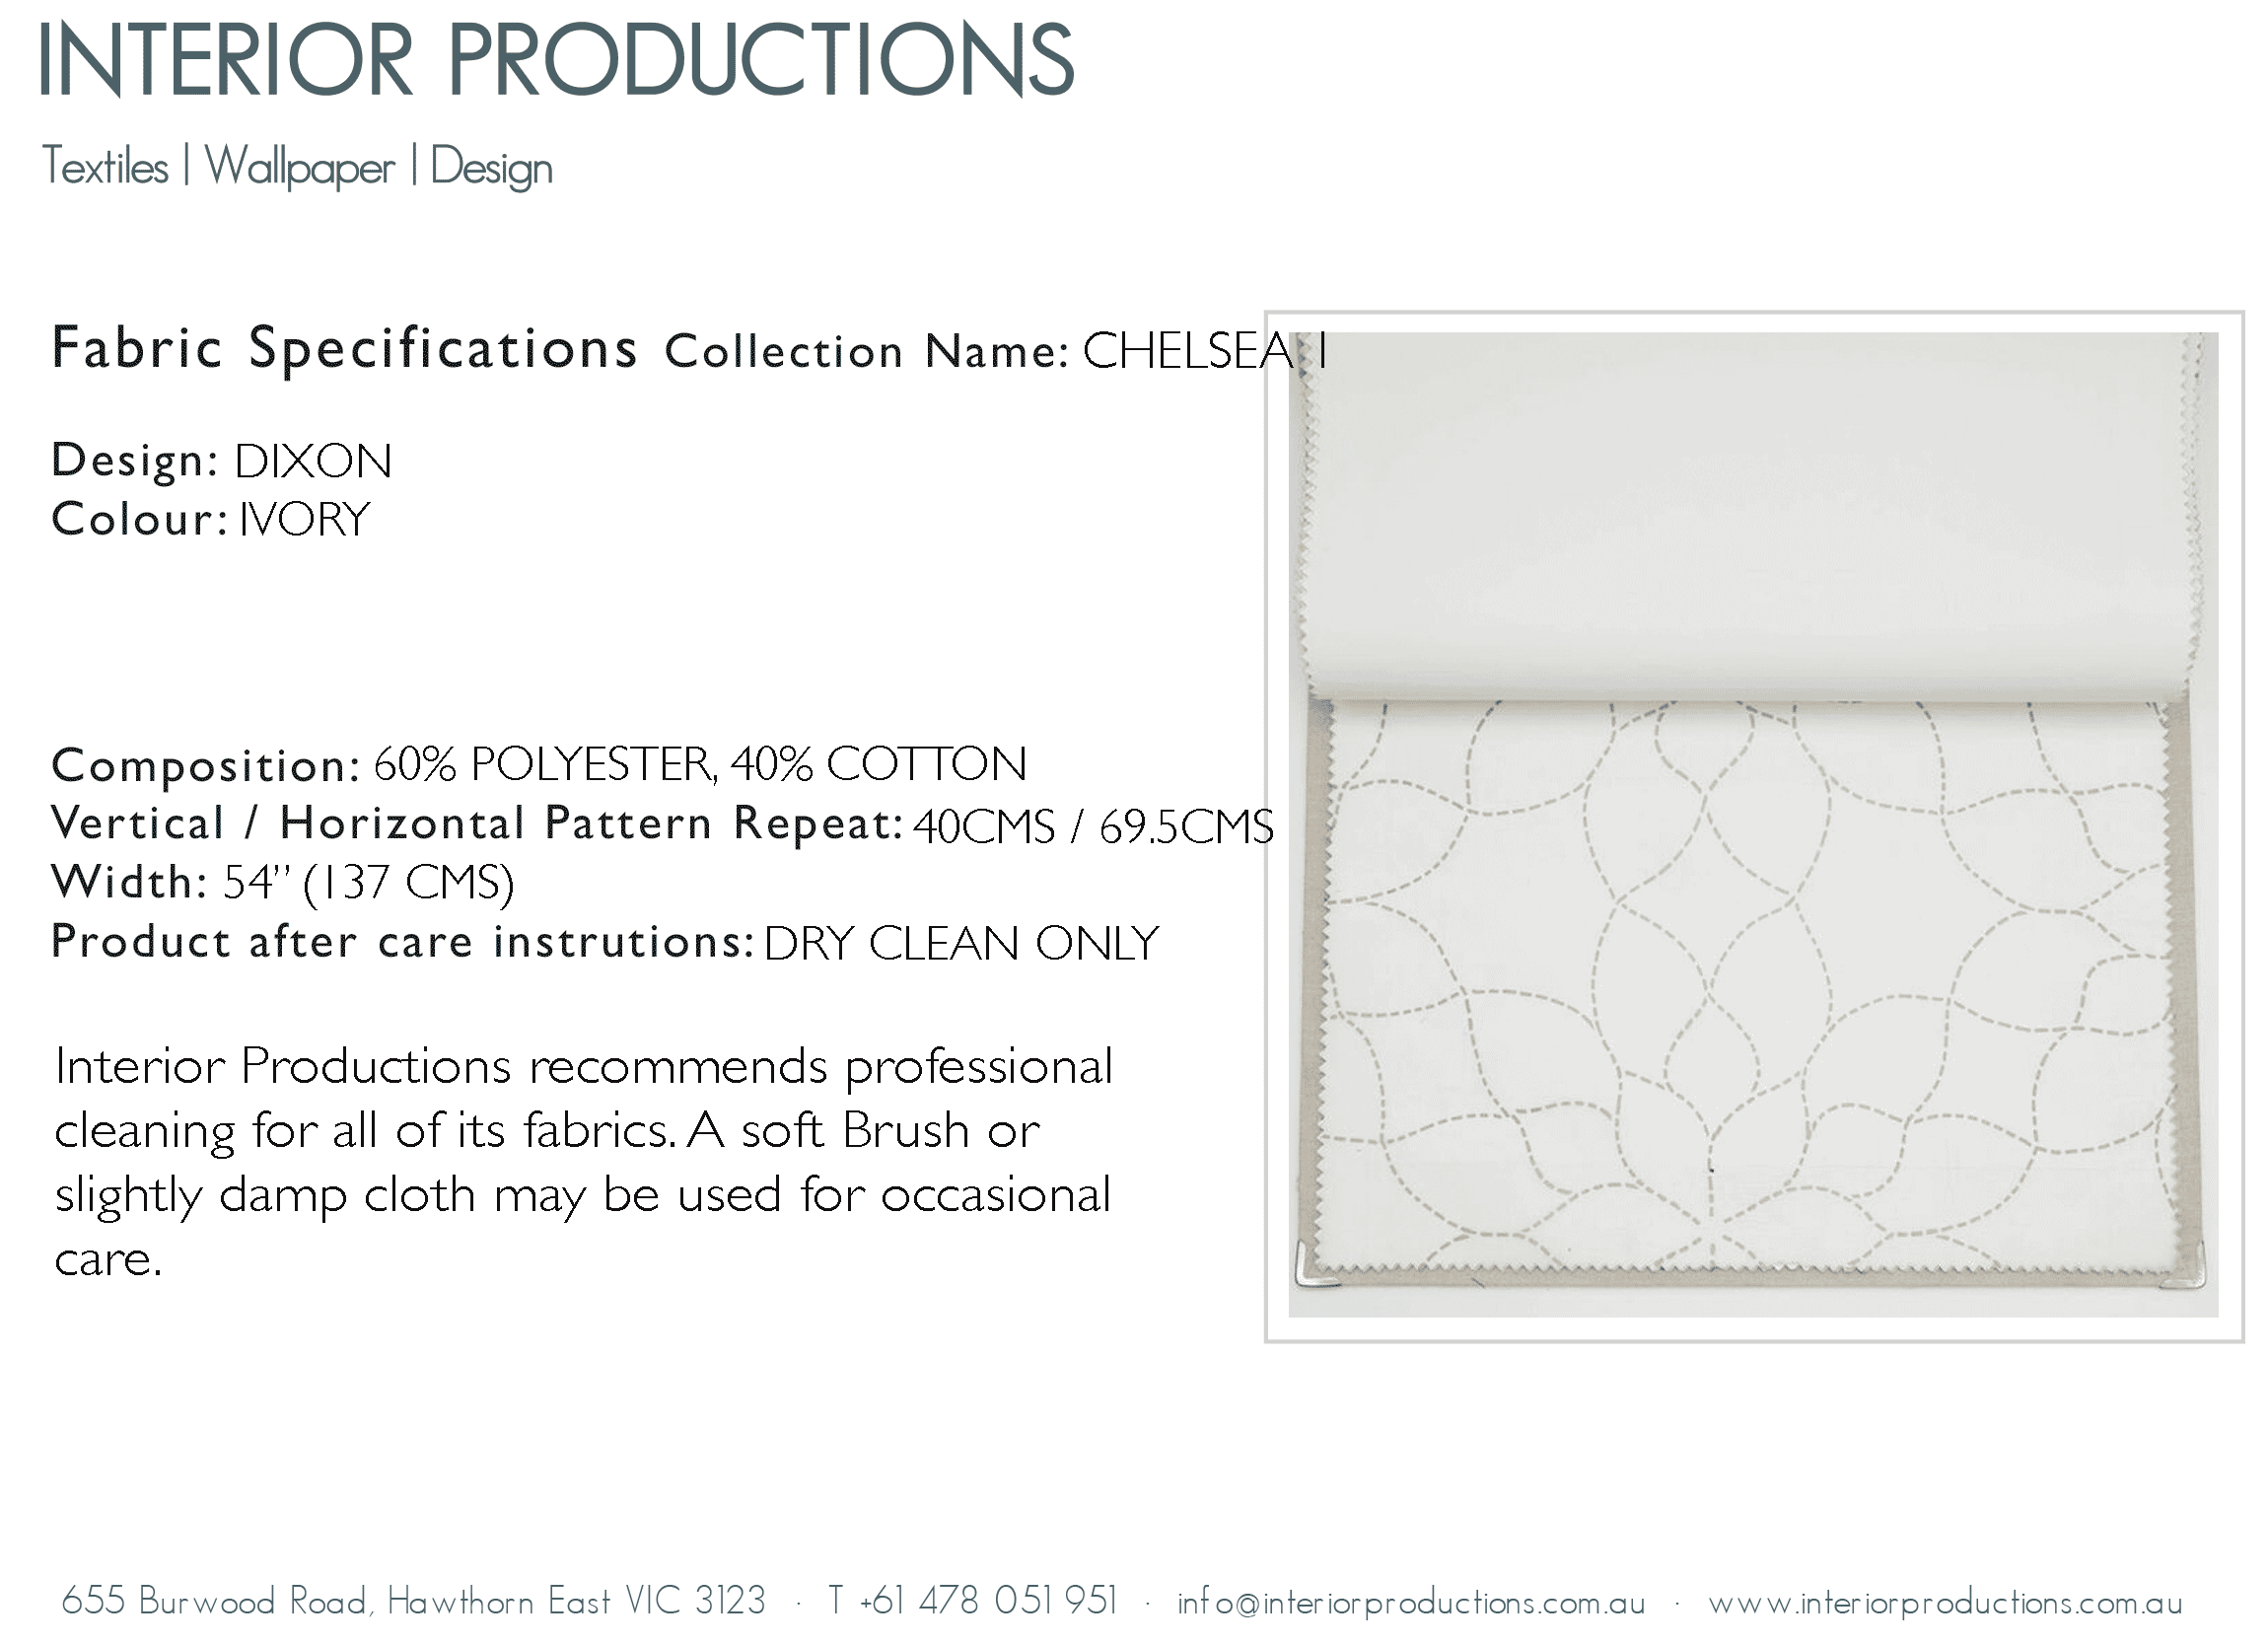 interior_productions_DIXON---IVORY